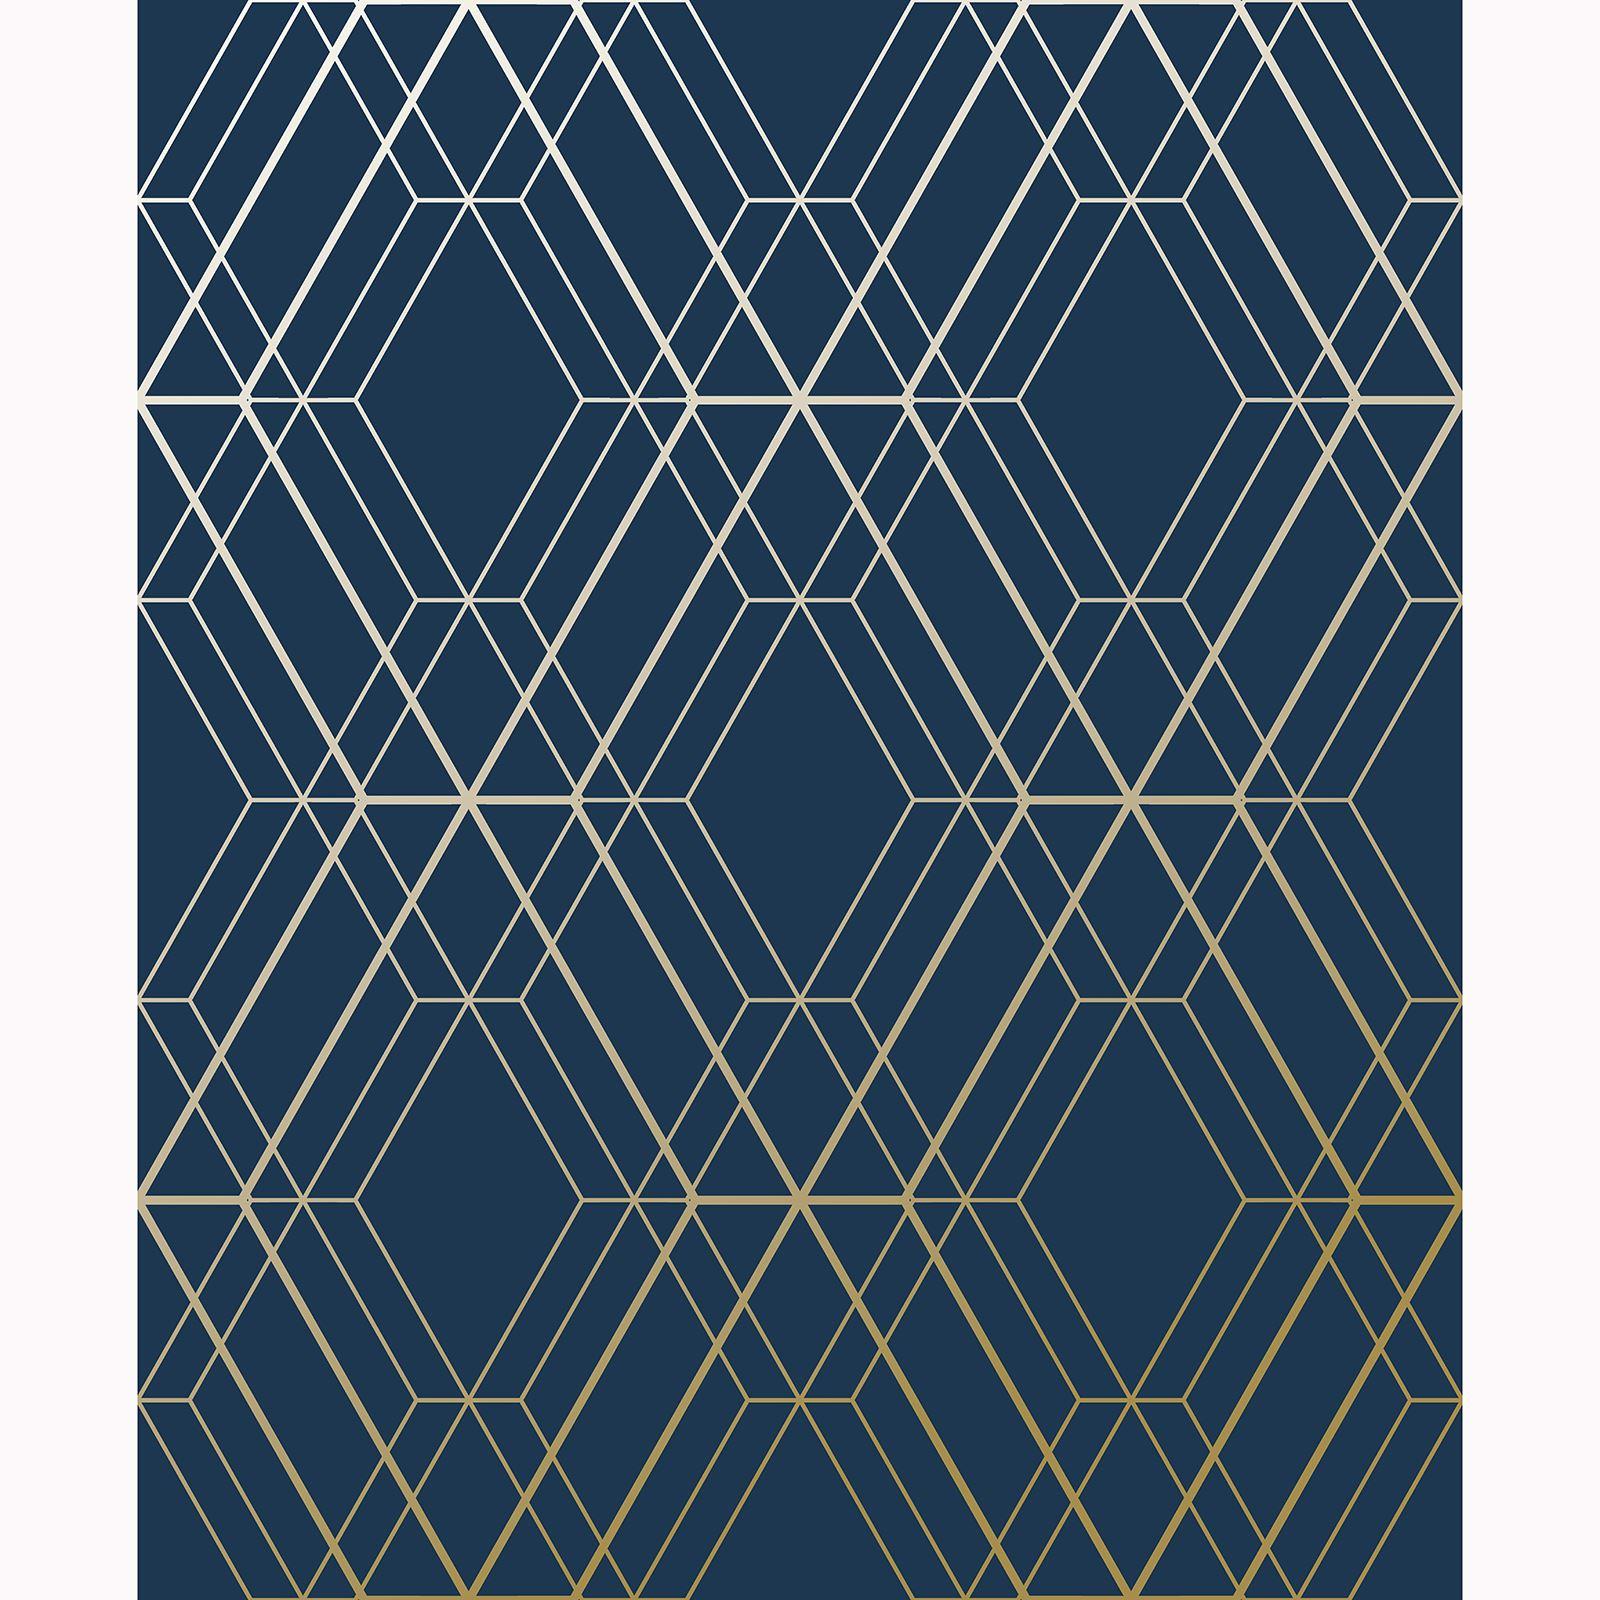 Metro Diamond Geometric Wallpaper Navy Blue Gold